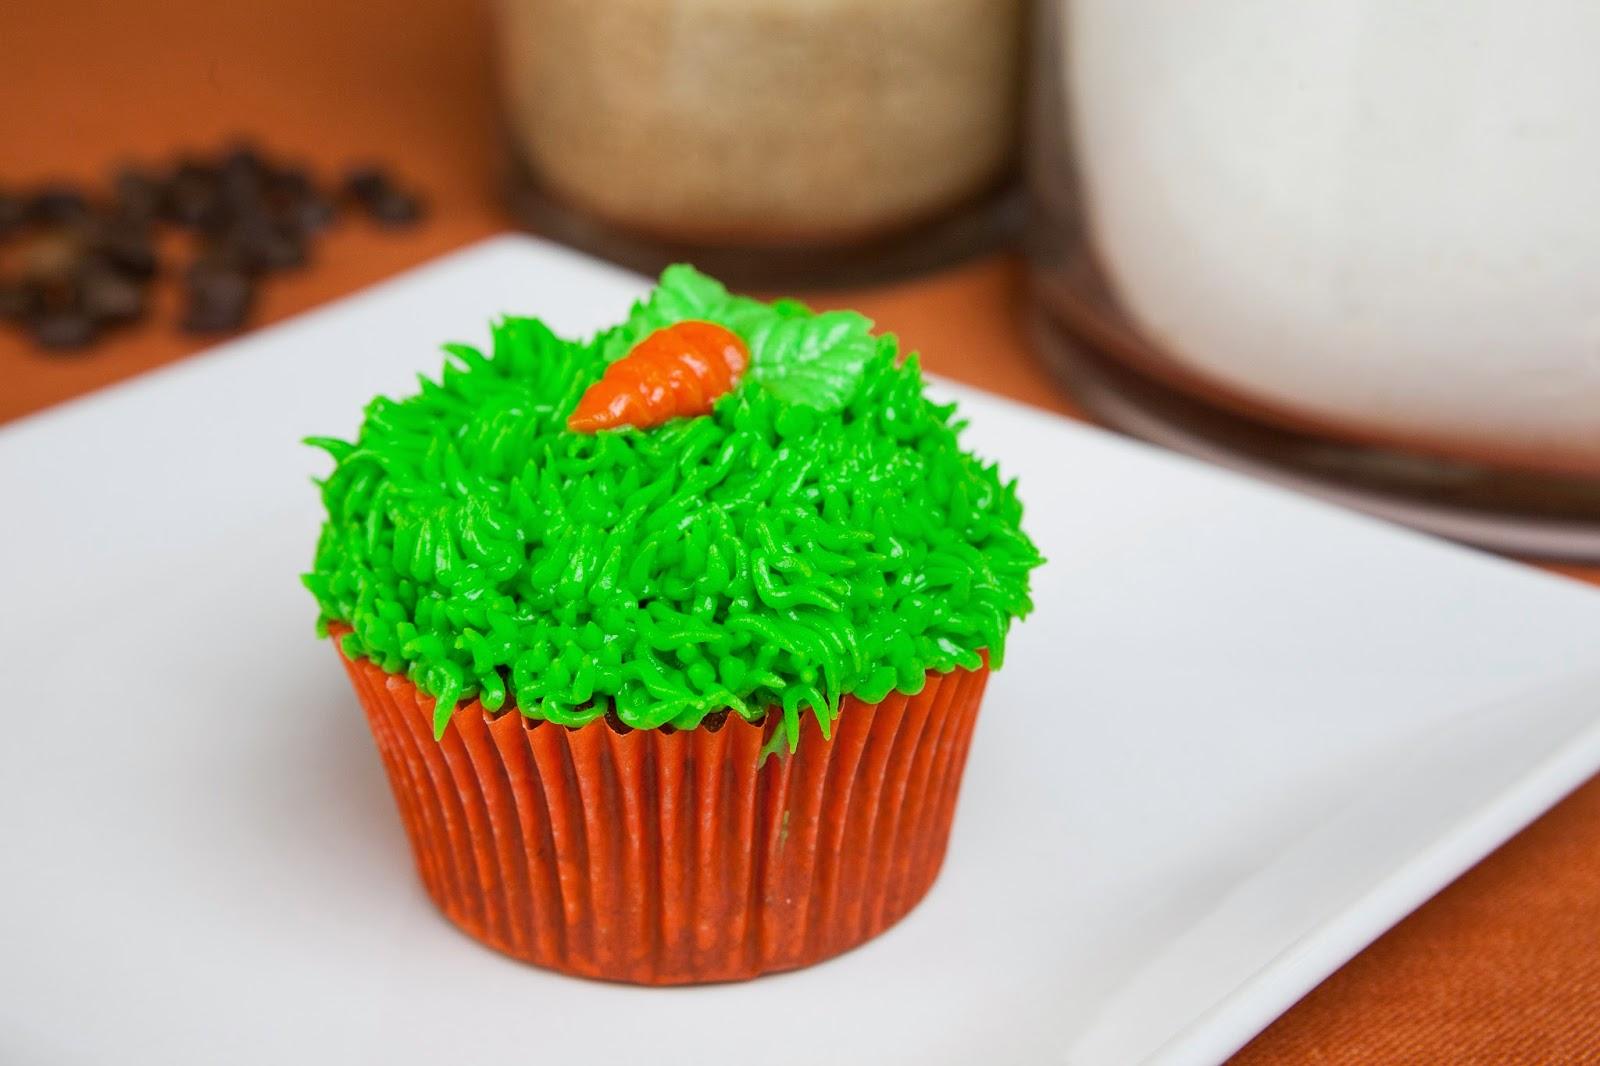 Celicioso,Gluten free bakery, pastelería sin gluten, original, cupcakes